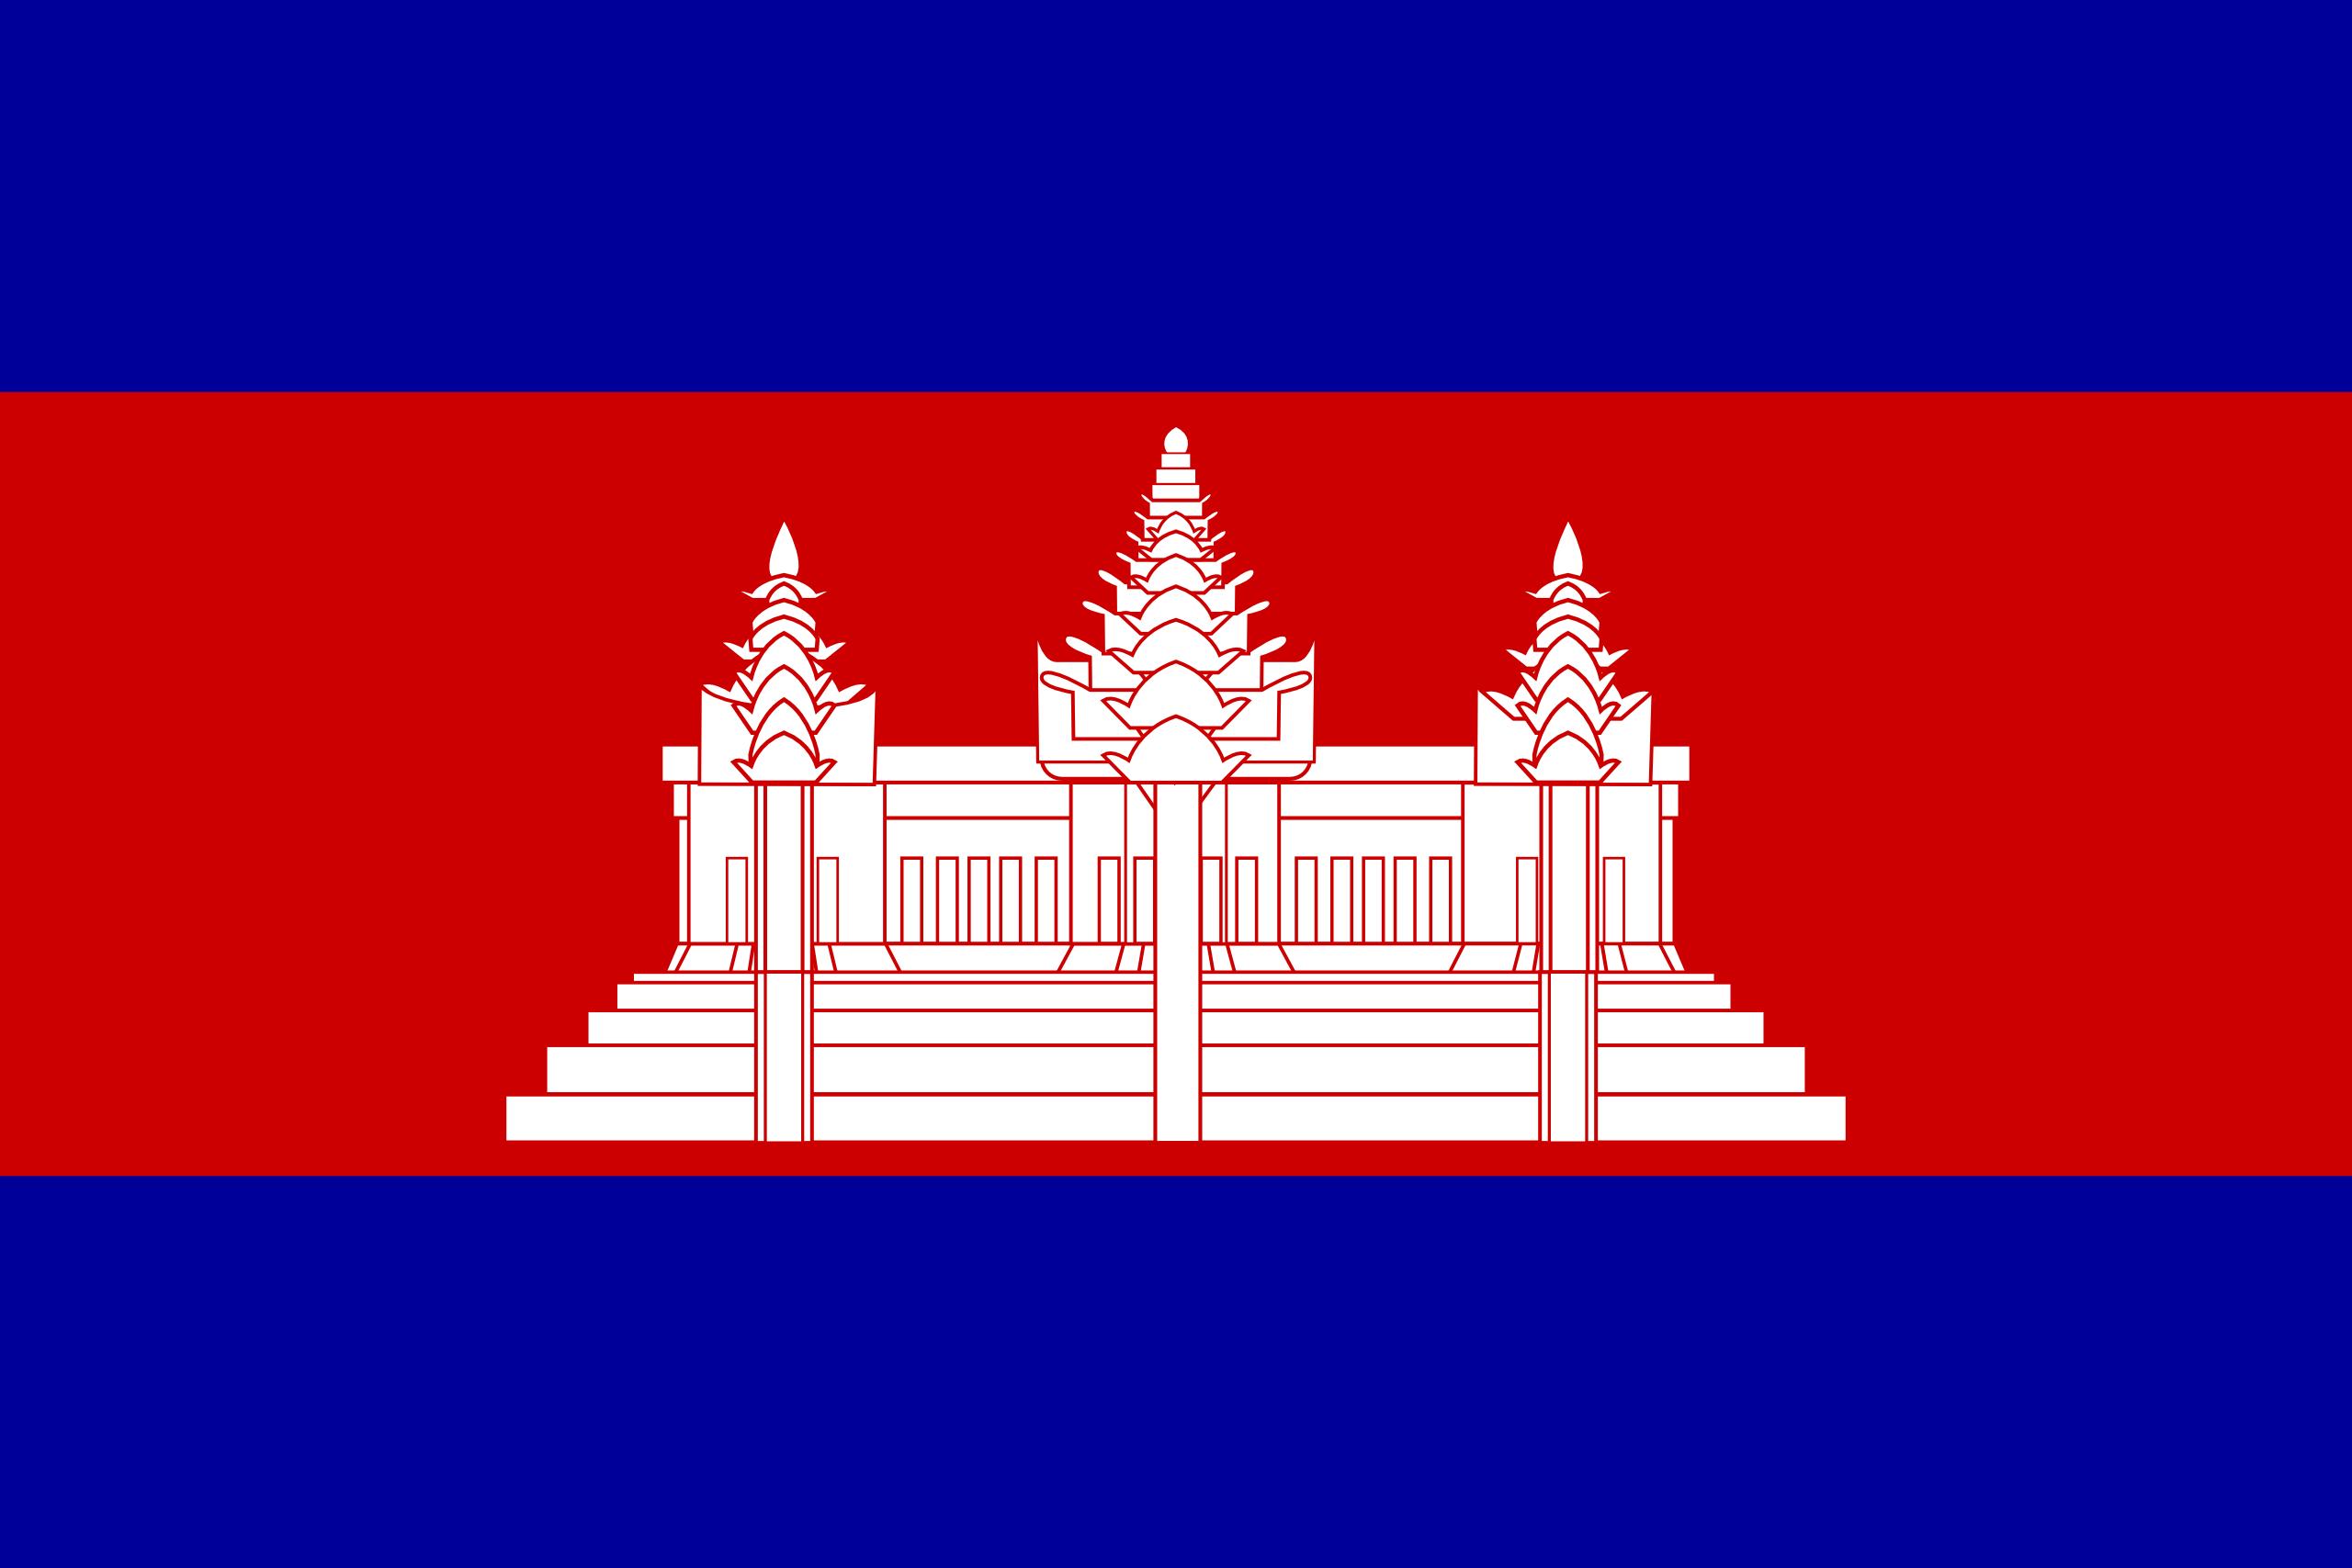 कंबोडिया, país, emblema, insignia, प्रतीक - HD वॉलपेपर - प्रोफेसर-falken.com